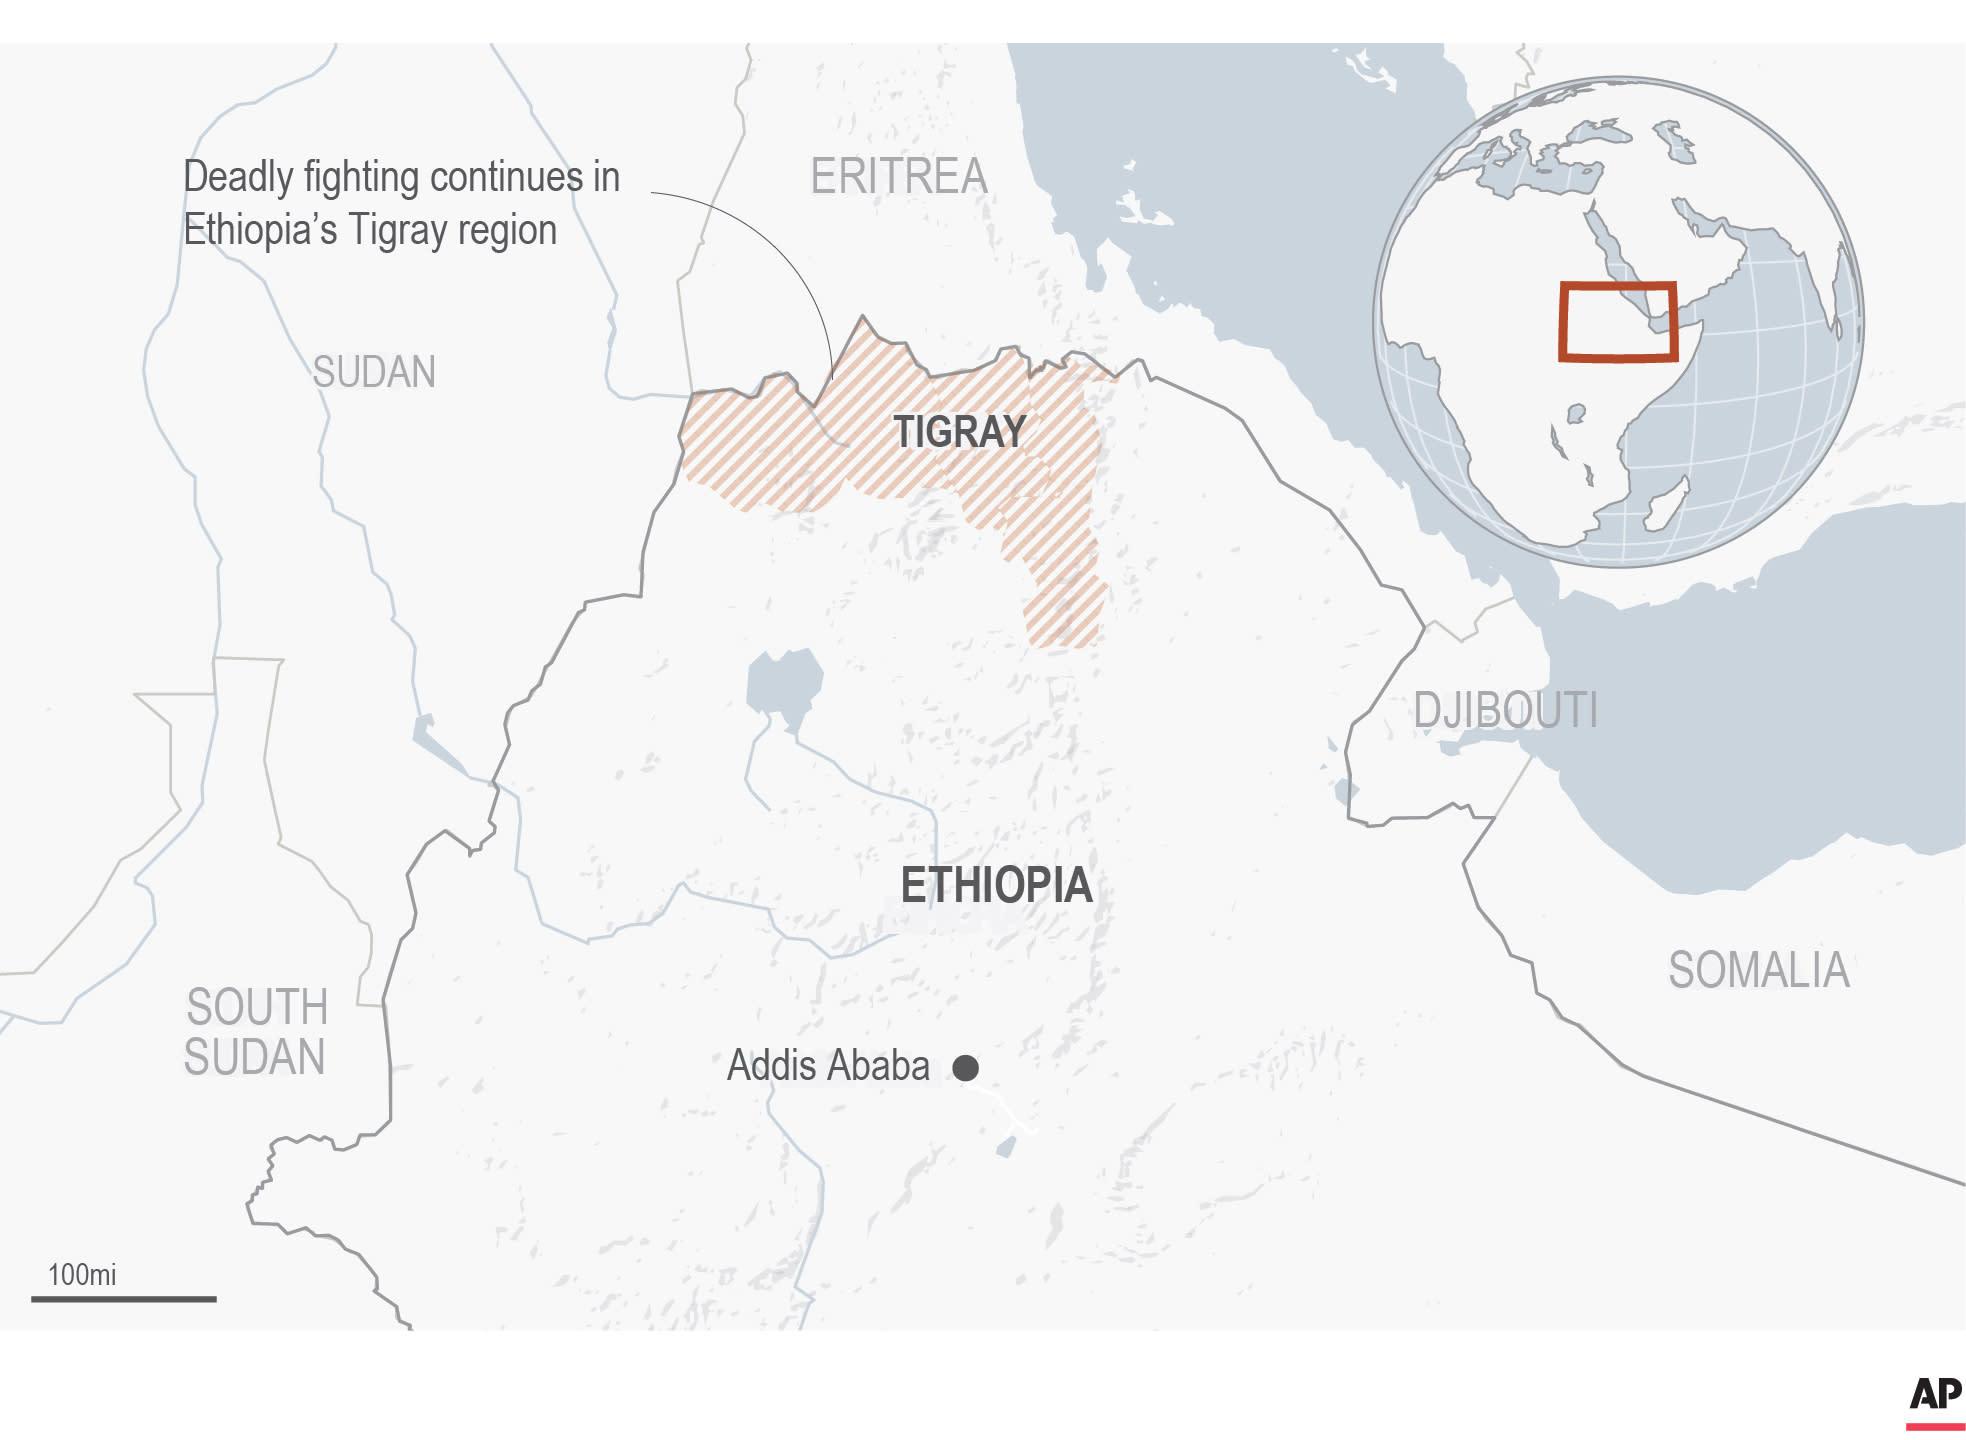 Sudan braces for up to 200,000 fleeing Ethiopia fighting